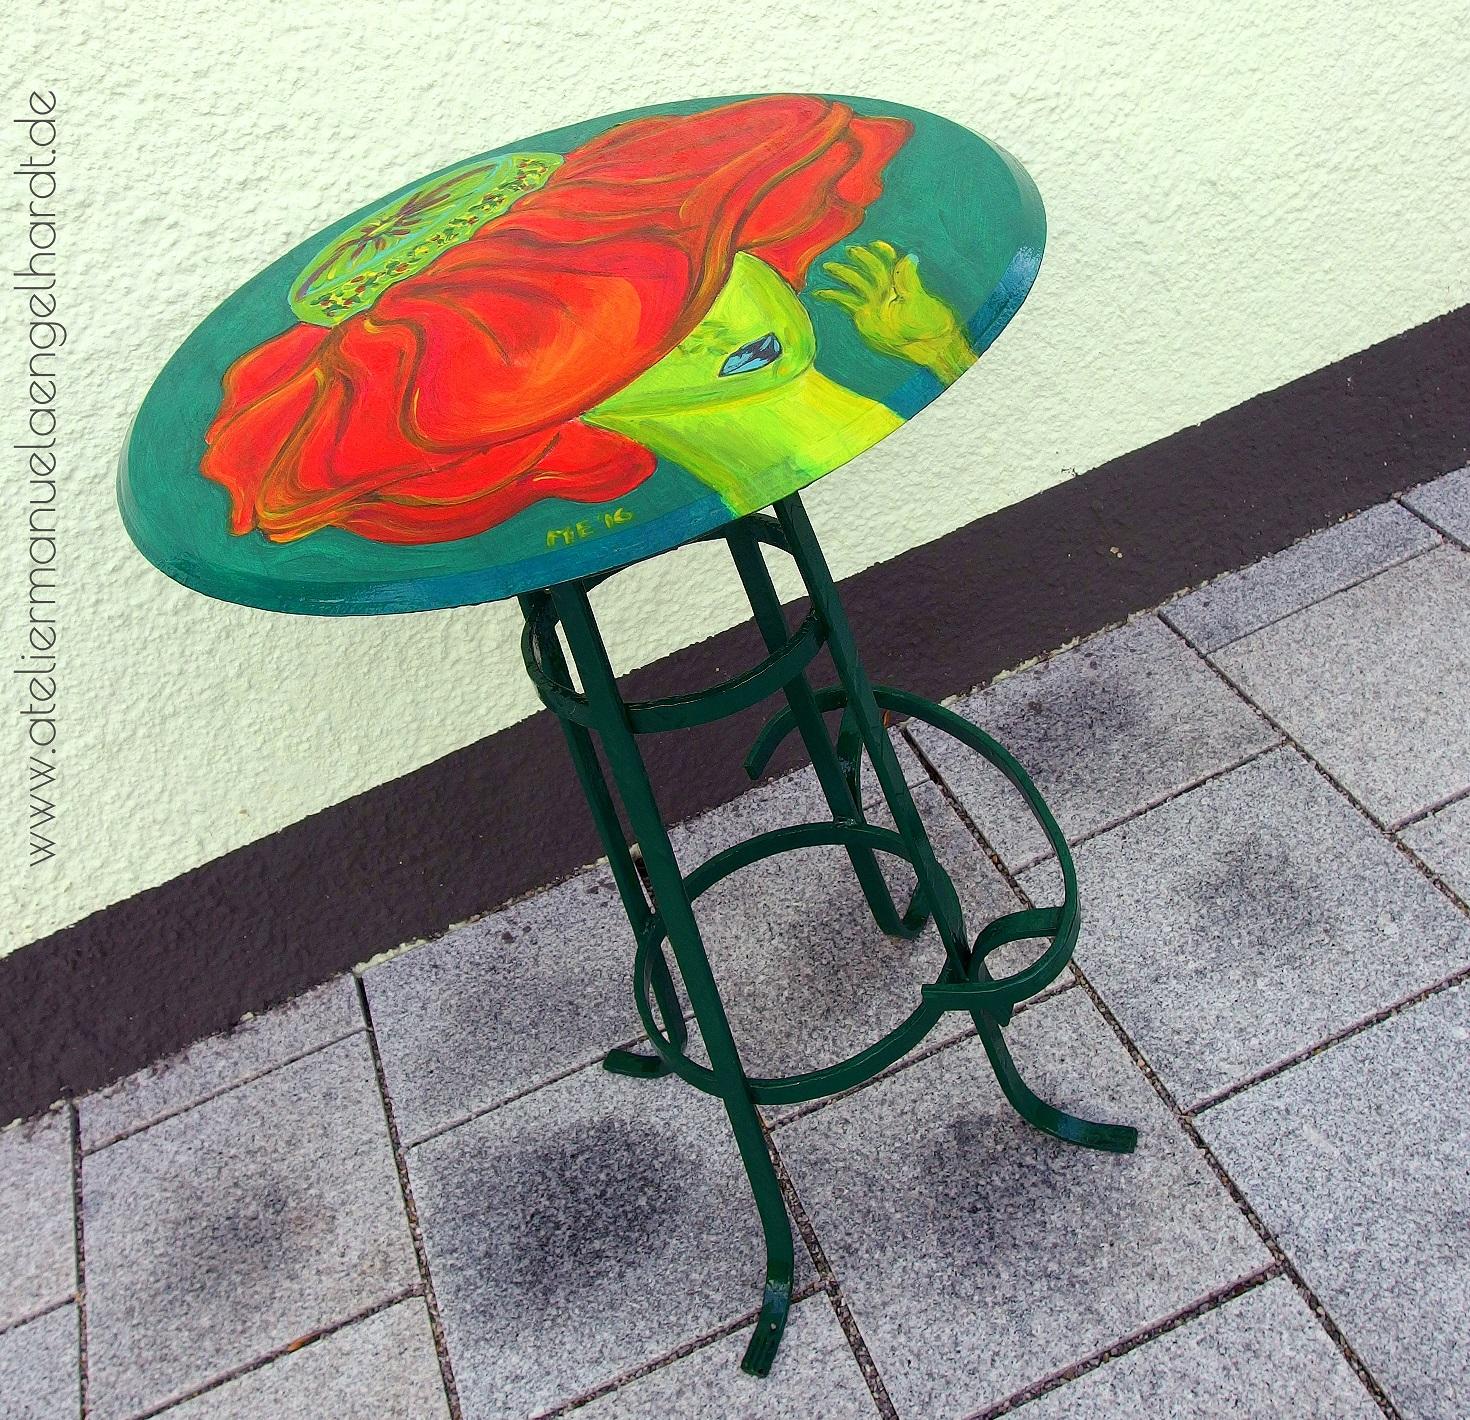 Upcycling Garten-/Balkontisch - Nicht mehr verfügbar.